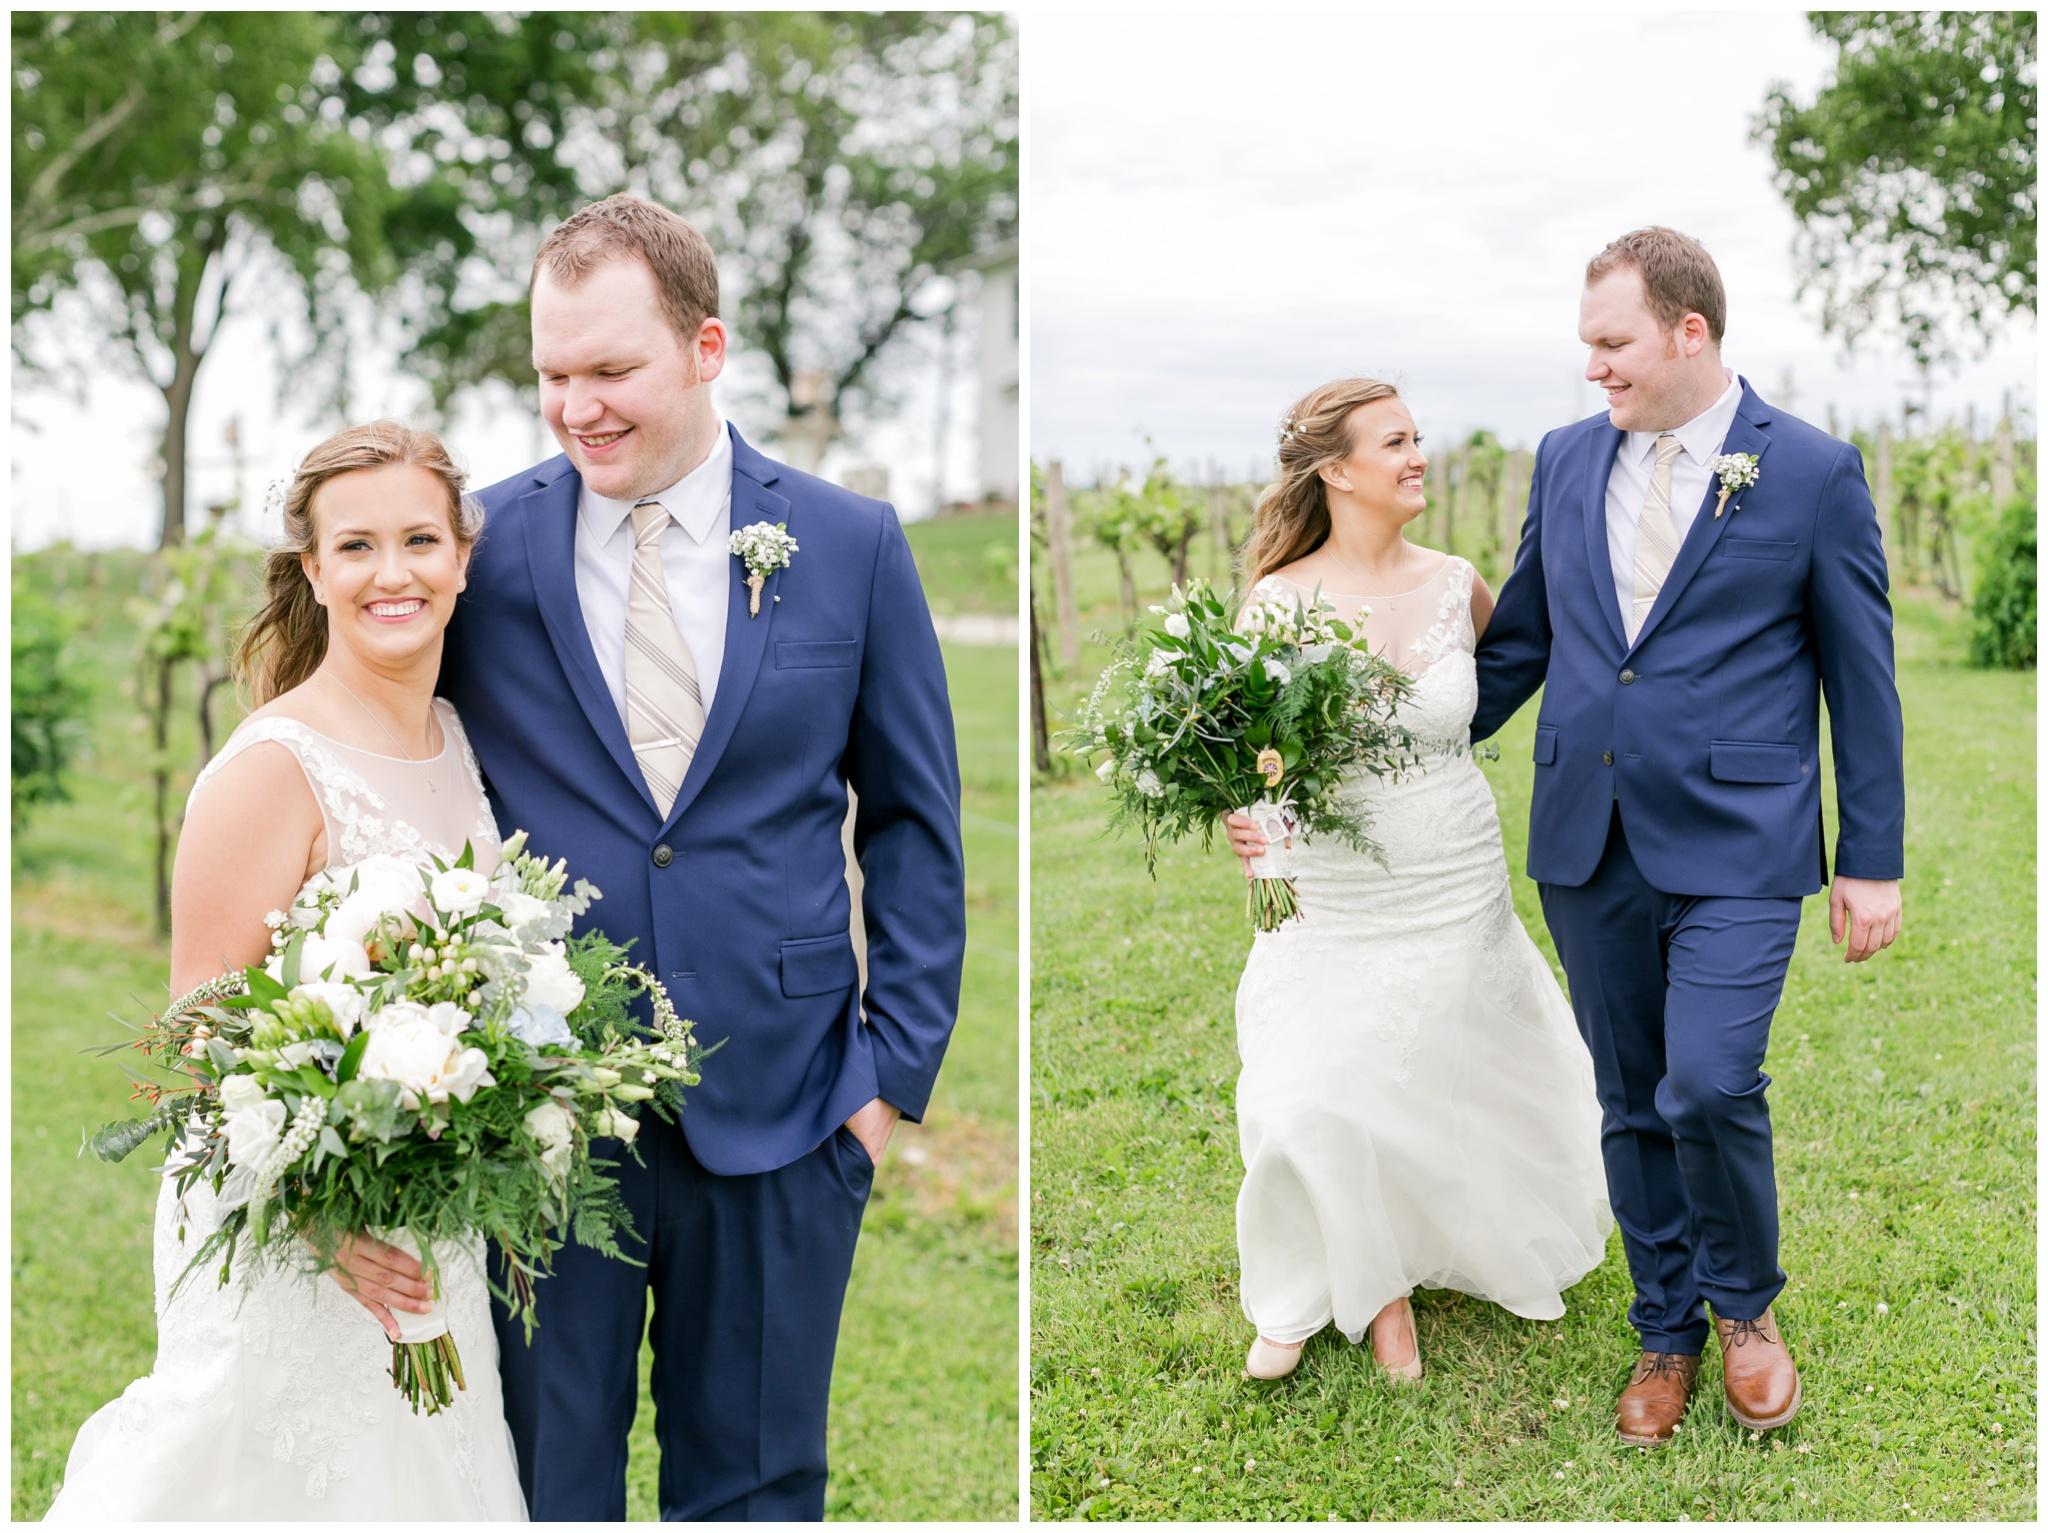 over_the_vines_wedding_edgerton_wisconsin_wedding_caynay_photo_4005.jpg